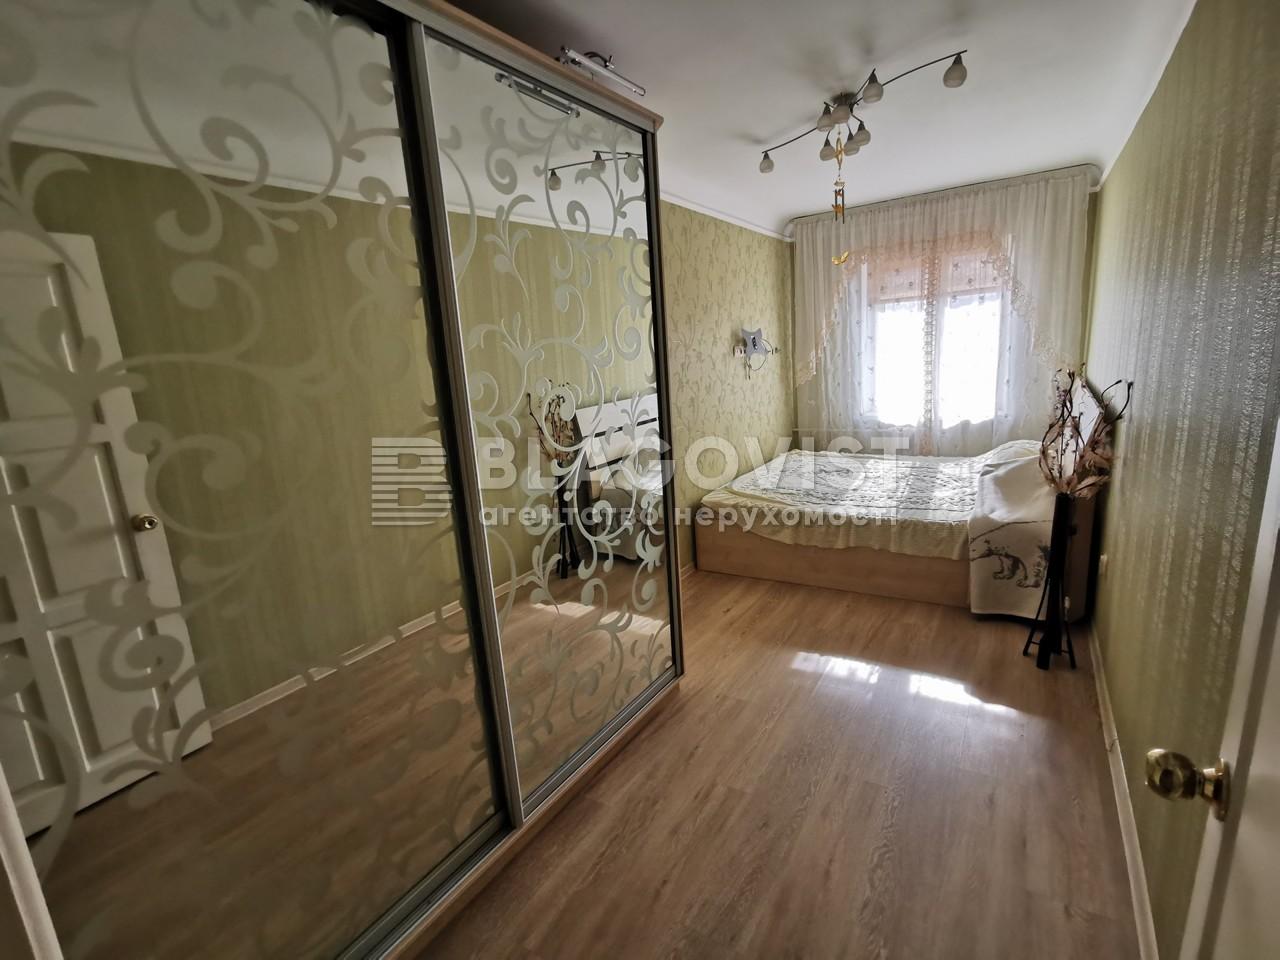 Квартира R-40023, Харьковское шоссе, 3, Киев - Фото 5